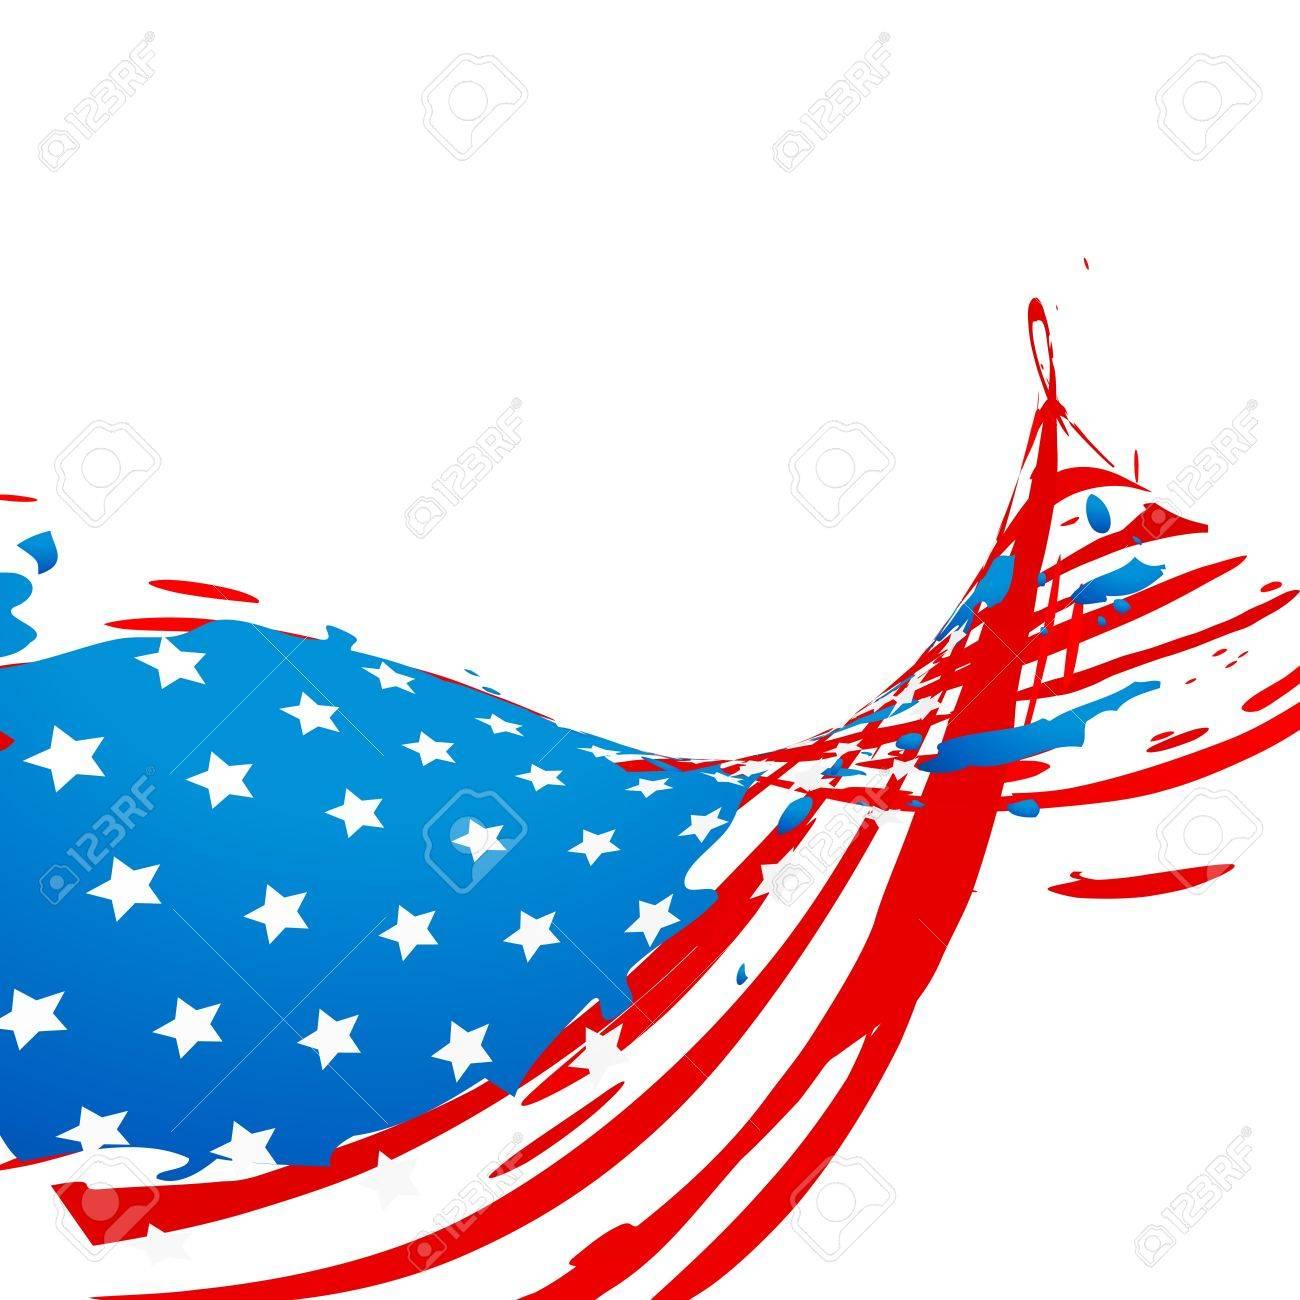 creative wave style american flag design Stock Vector - 19978826